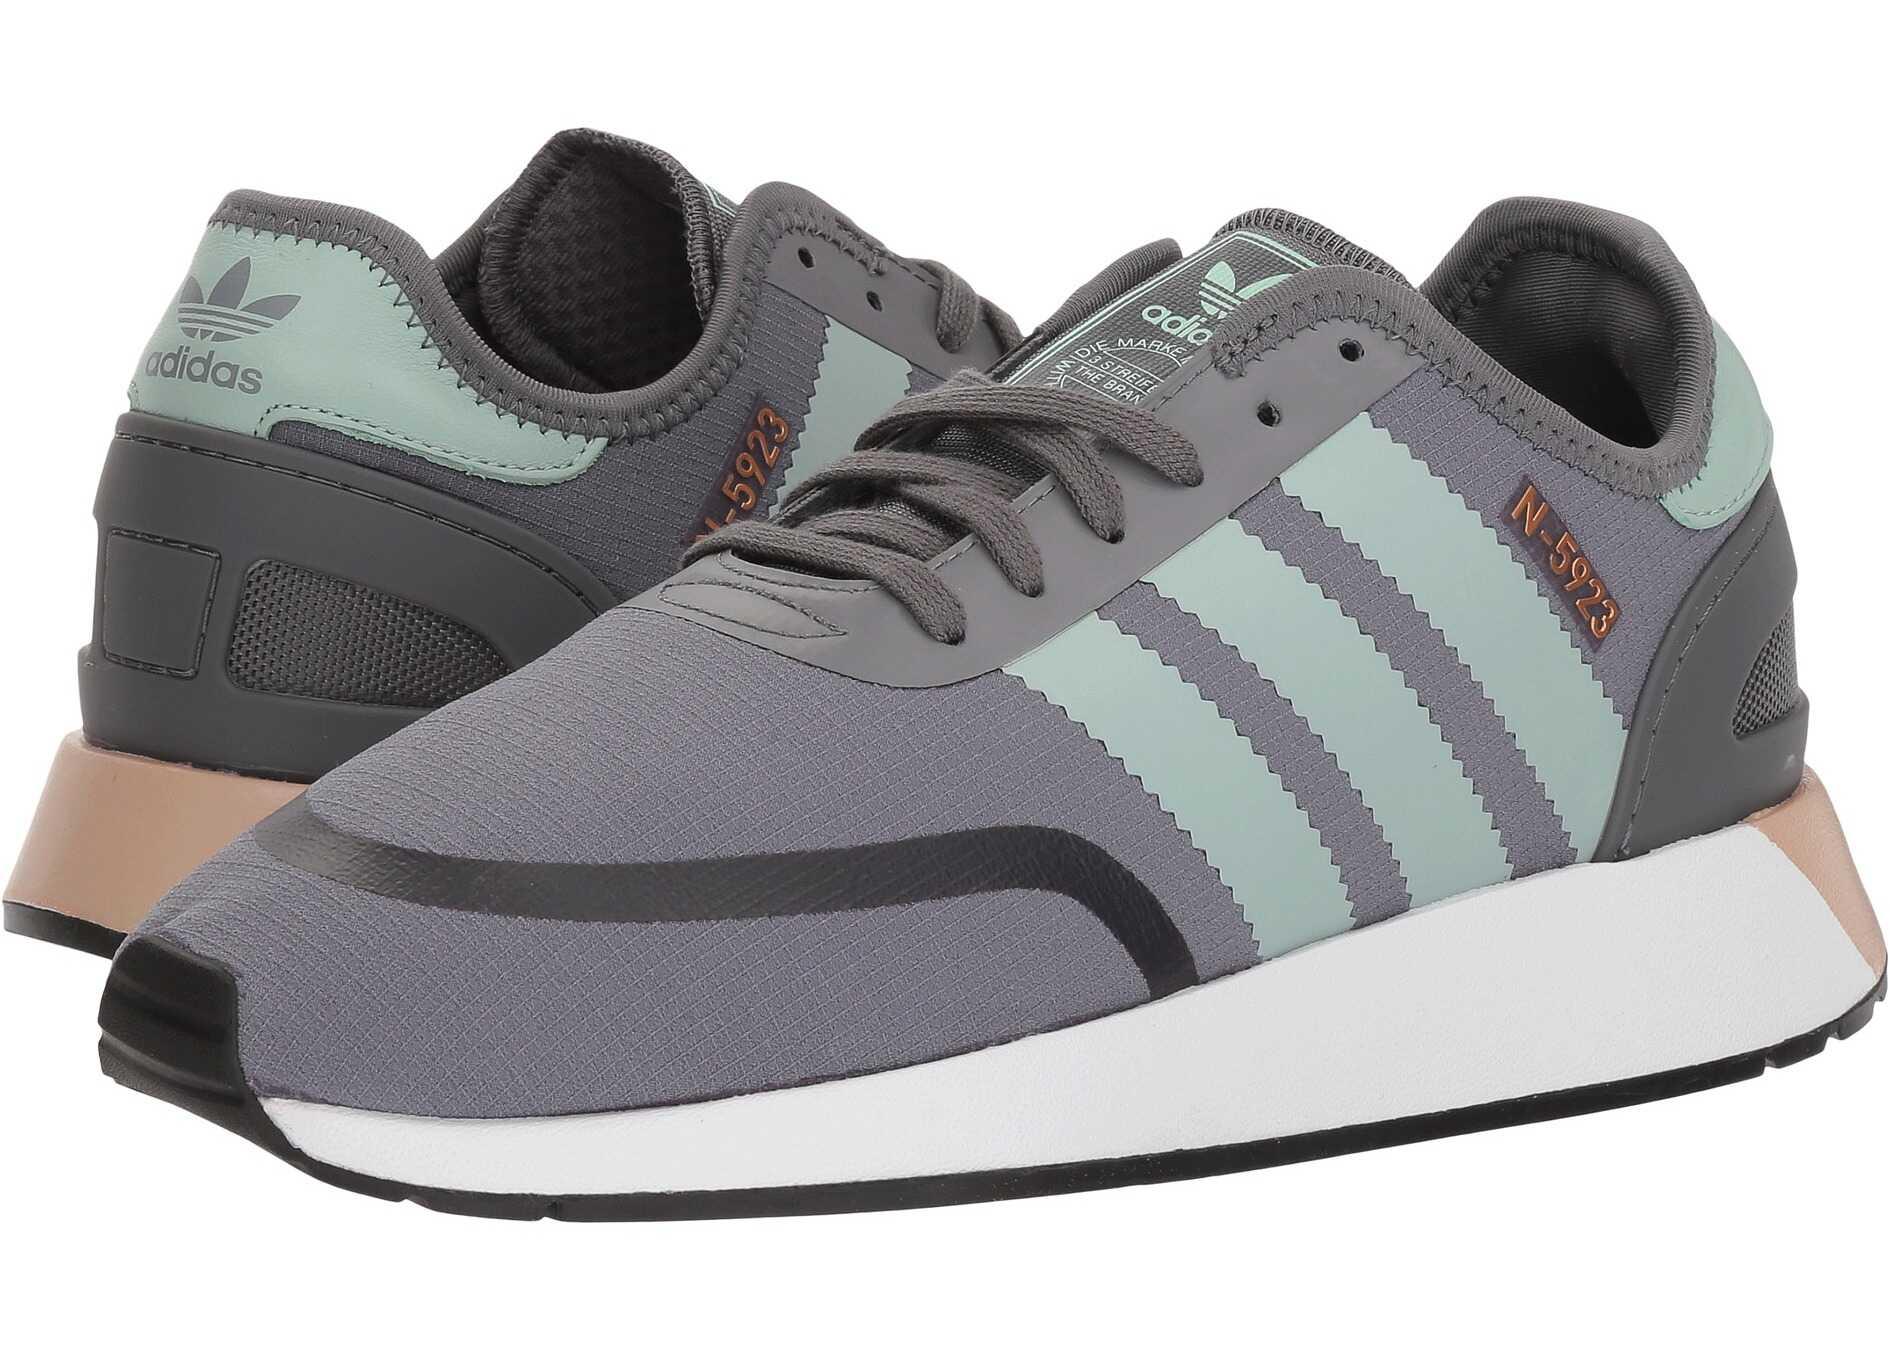 adidas Originals Iniki Runner CLS Grey Four/Ash Green/White